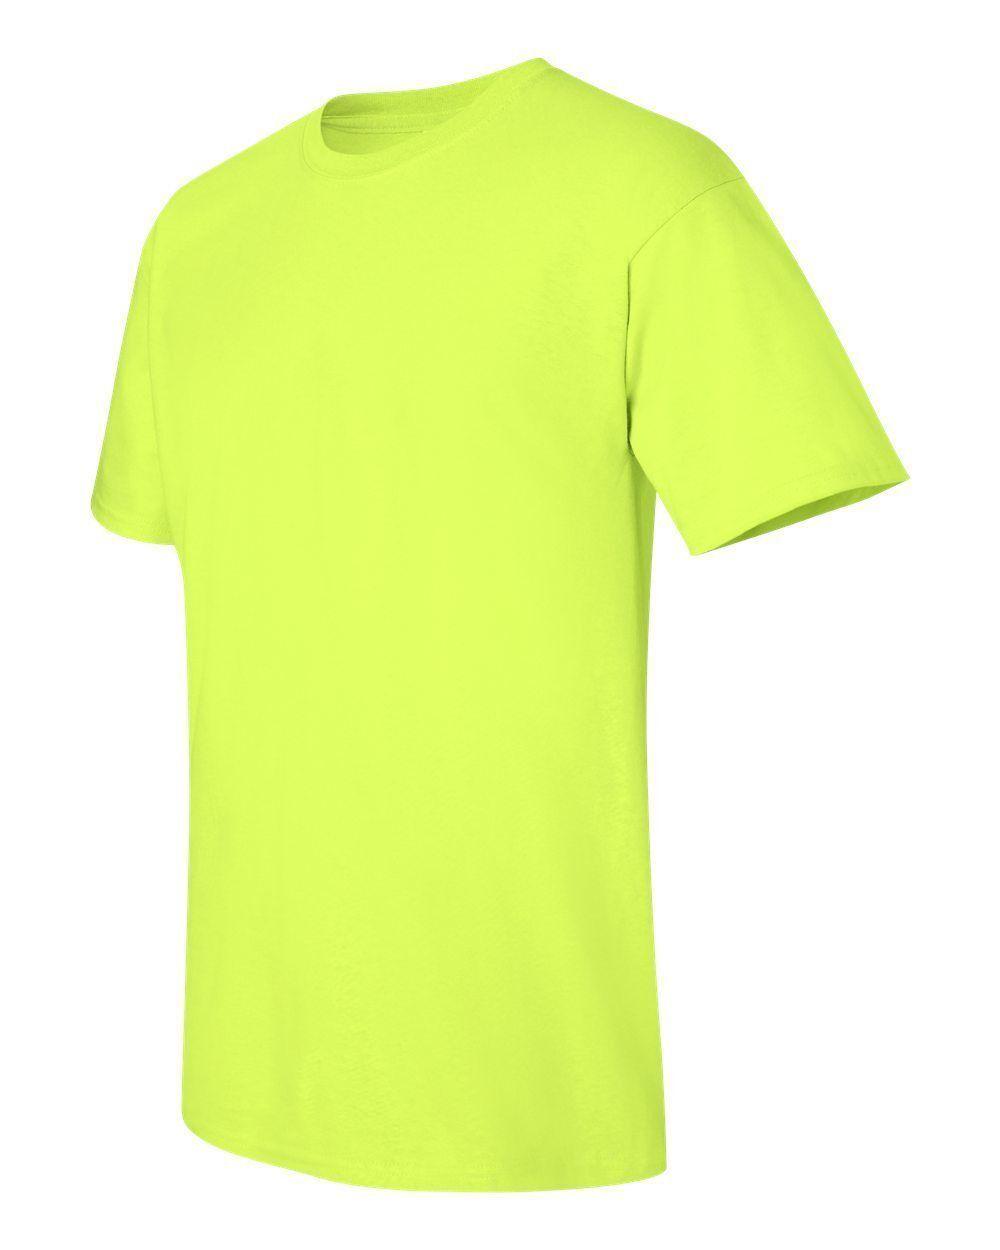 12 Gildan 5000 Heavy Cotton 50 50 SAFETY GREEN Adult T-Shirts Bulk Lot S M L XL